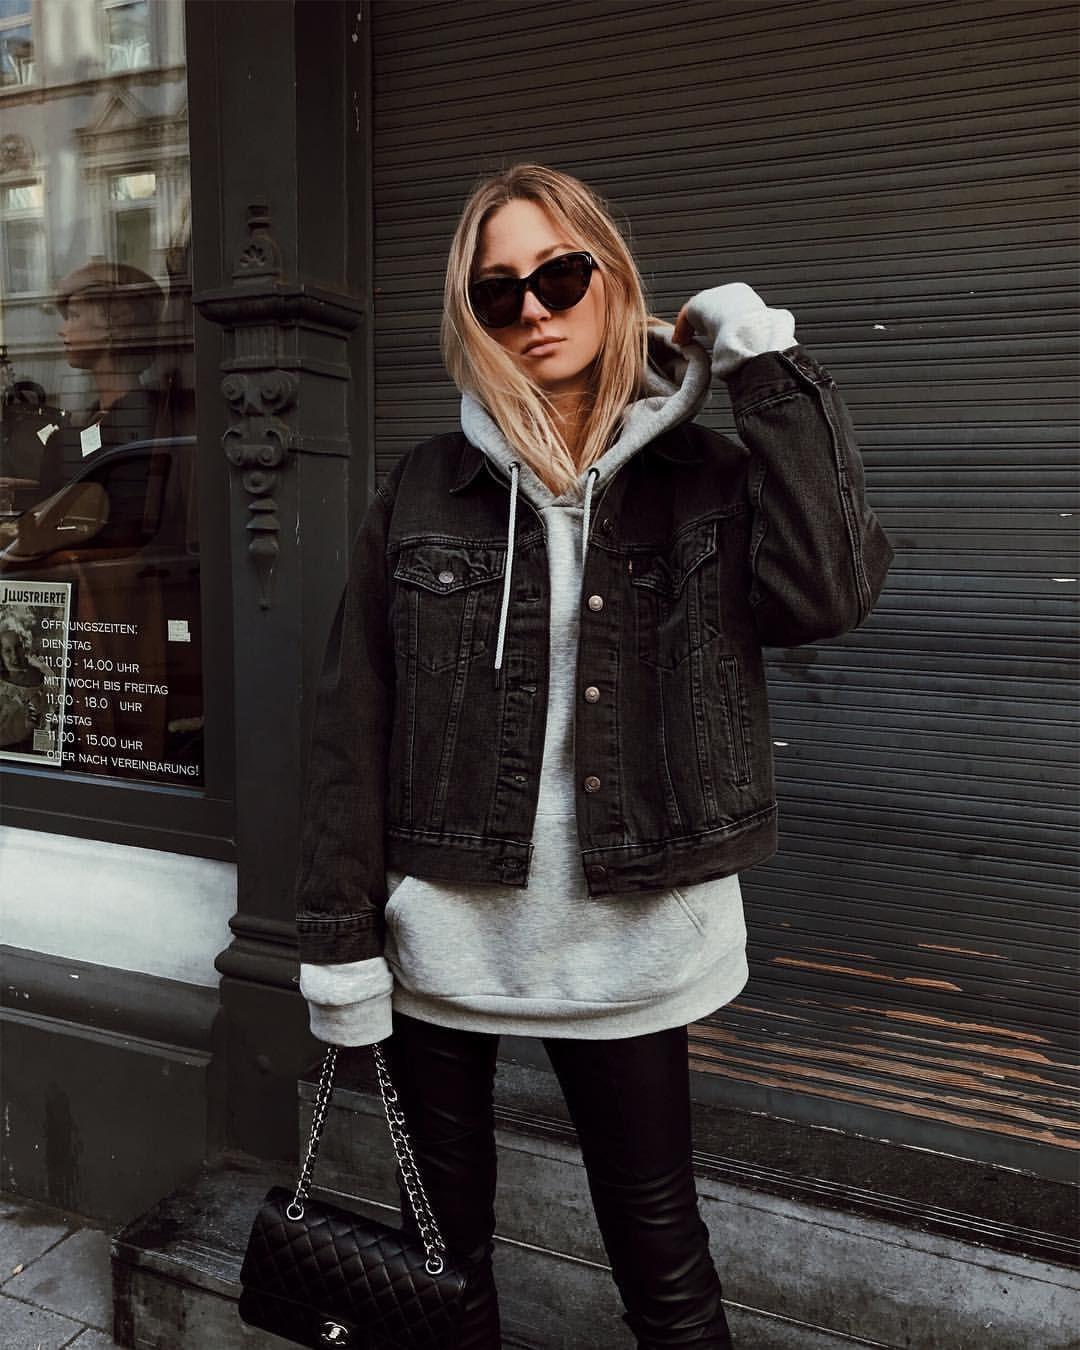 12 4 Tys Otmetok Nravitsya 357 Kommentariev Elisa Ludwig Allaboutelisa V Instagram Leather Pants His H Denim Jacket Women Athleisure Fashion Fashion